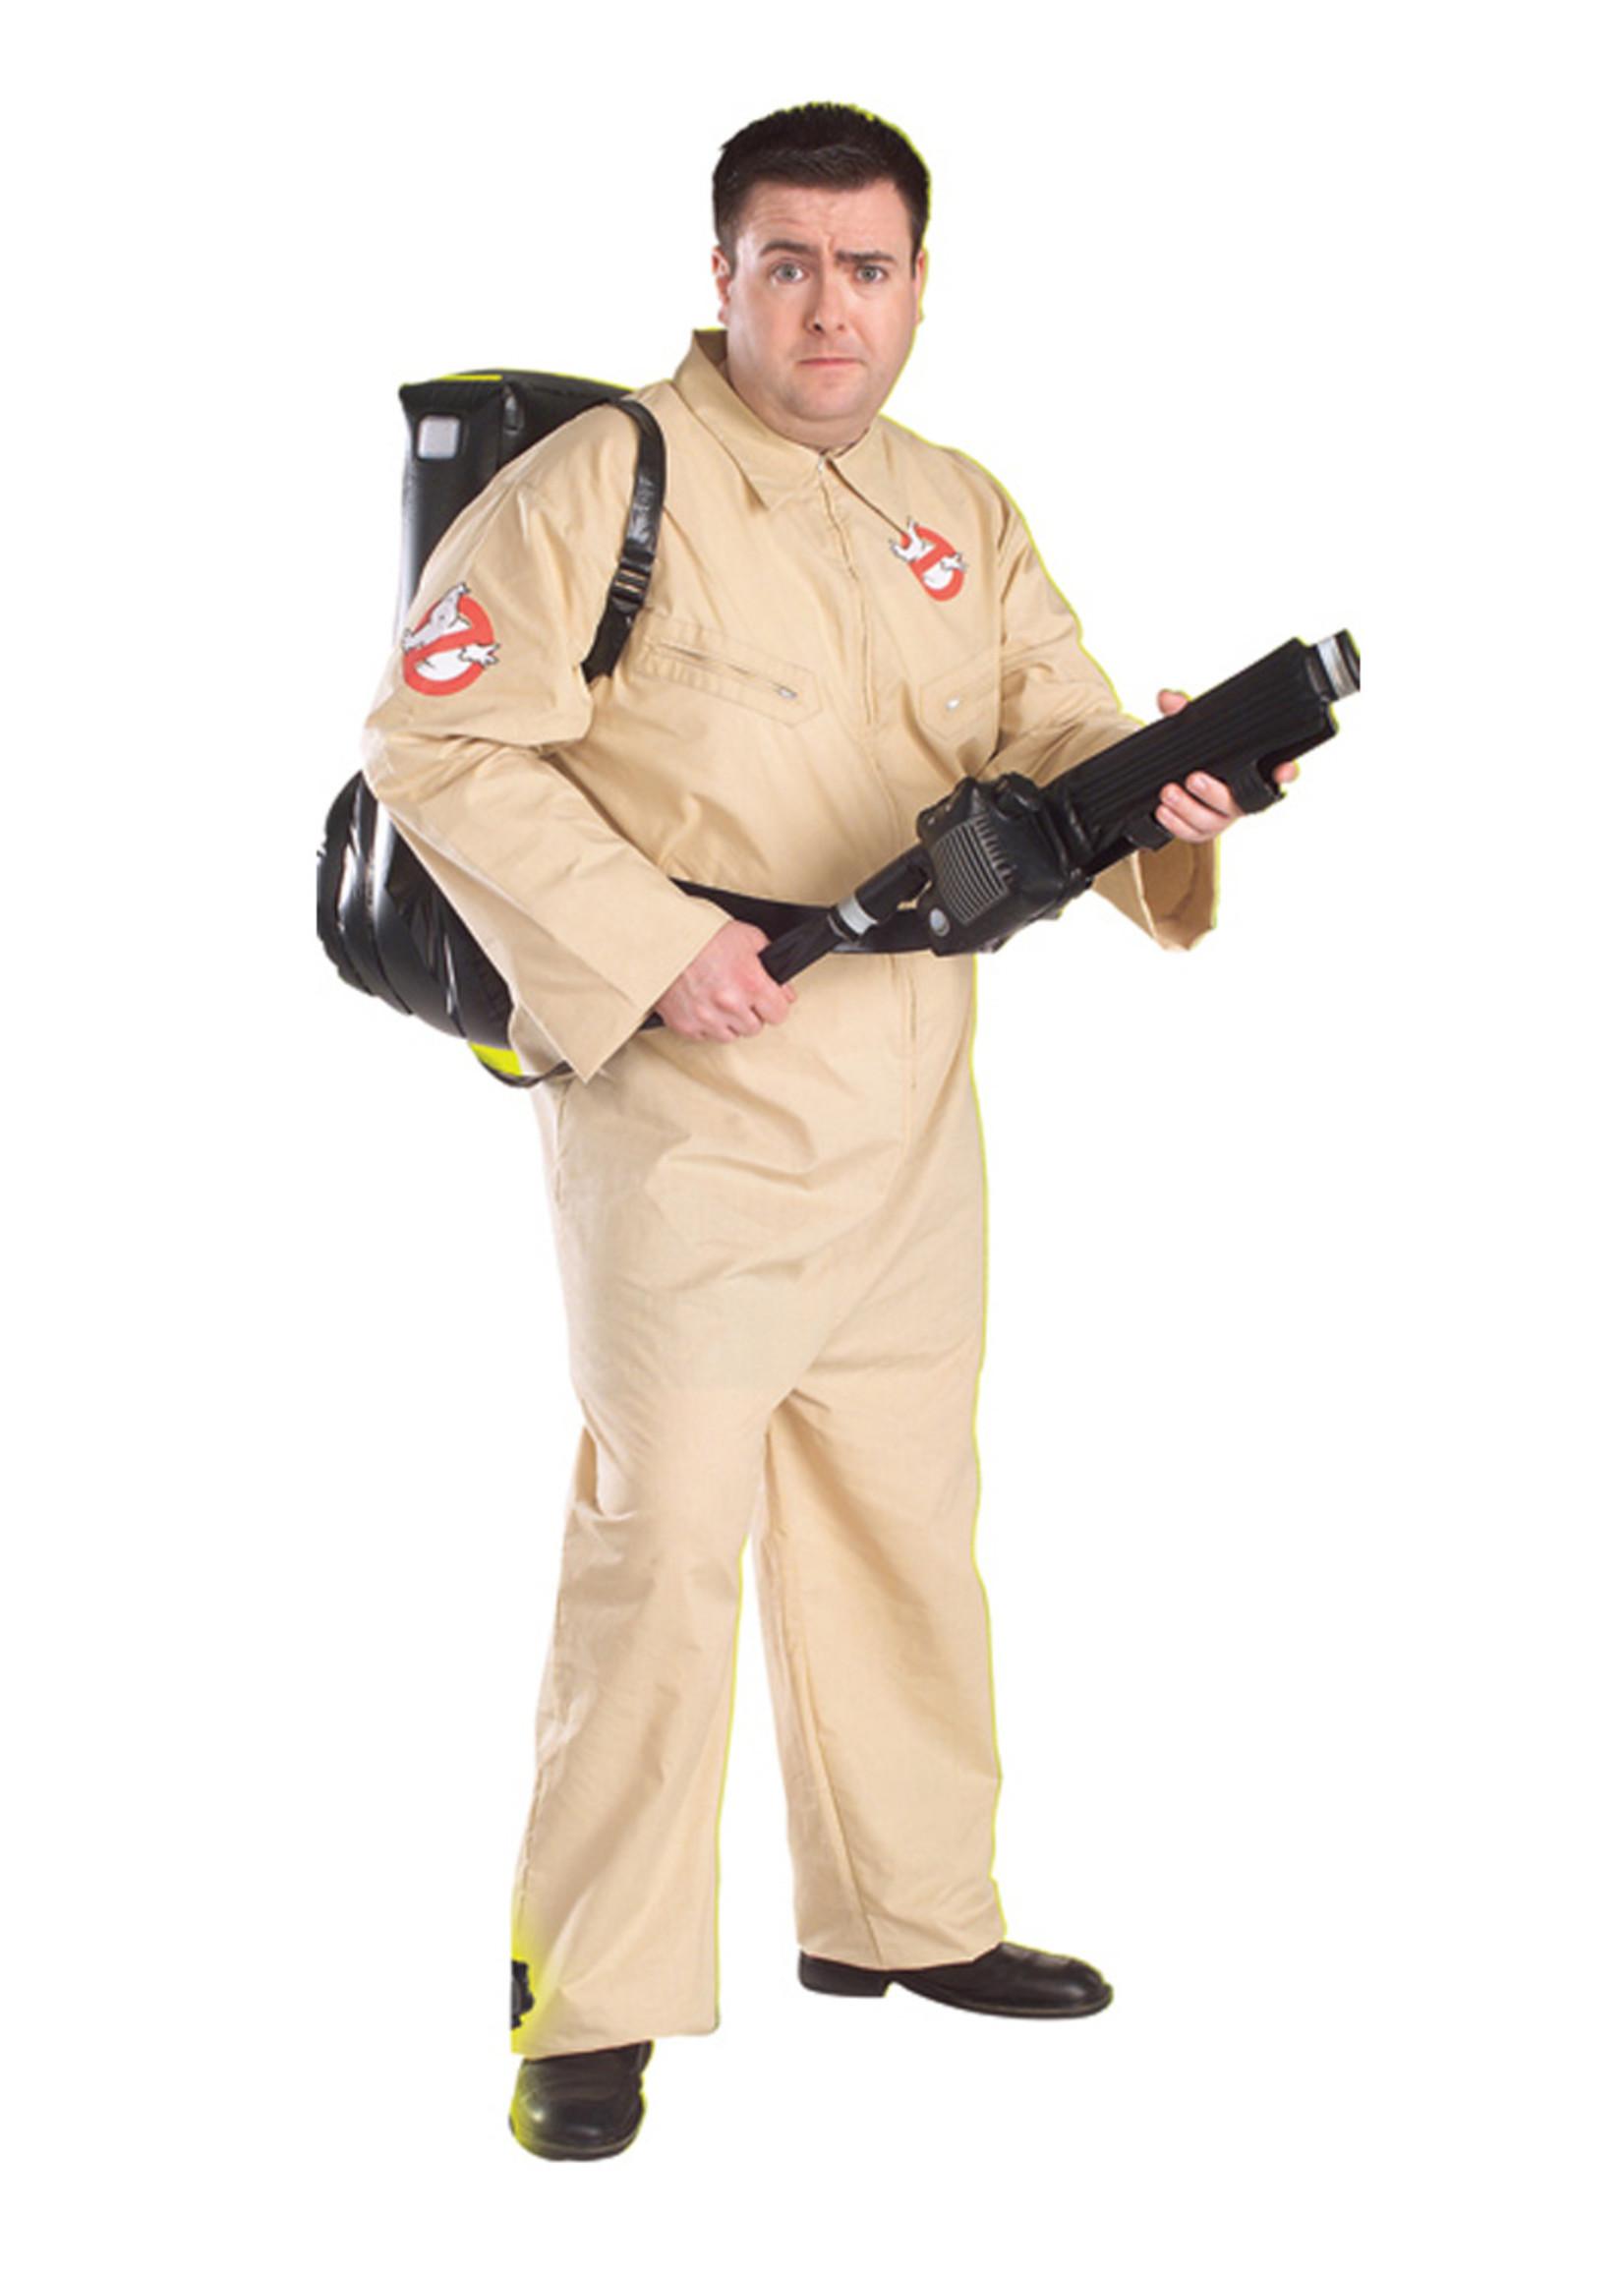 Ghostbusters Costume - Men's Plus